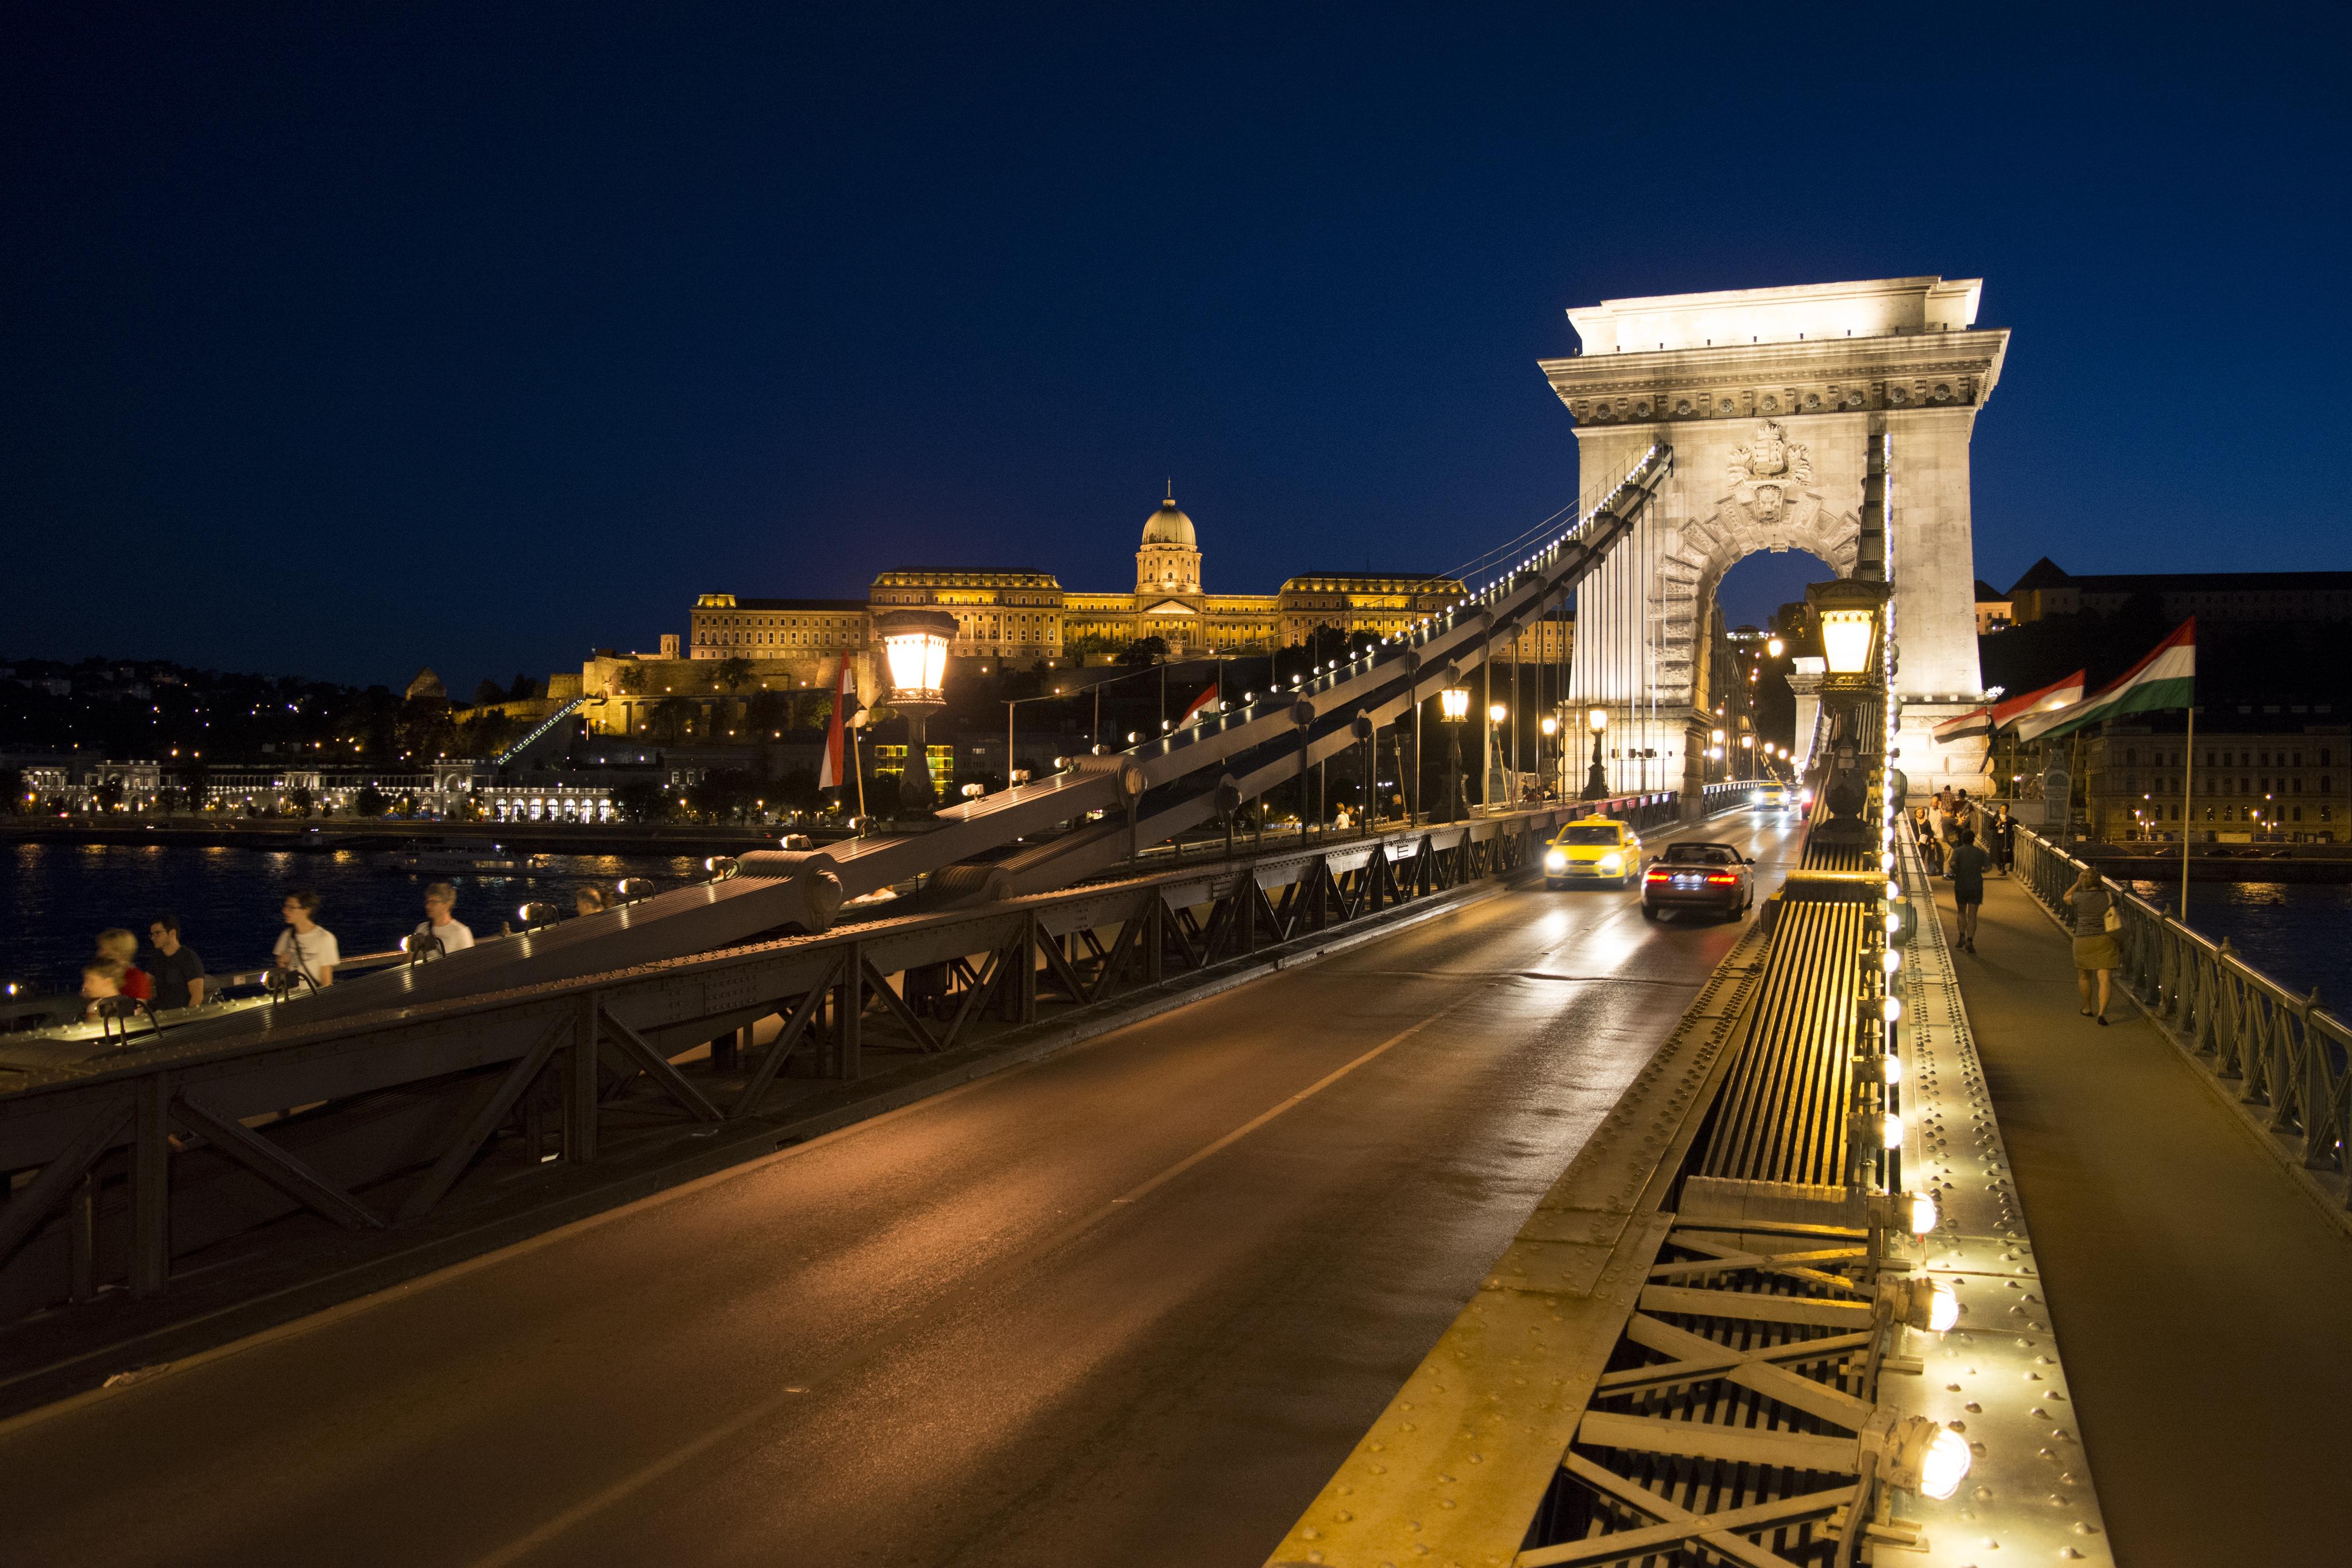 Budapest_Chain_bridge_and_Buda_Castle_at